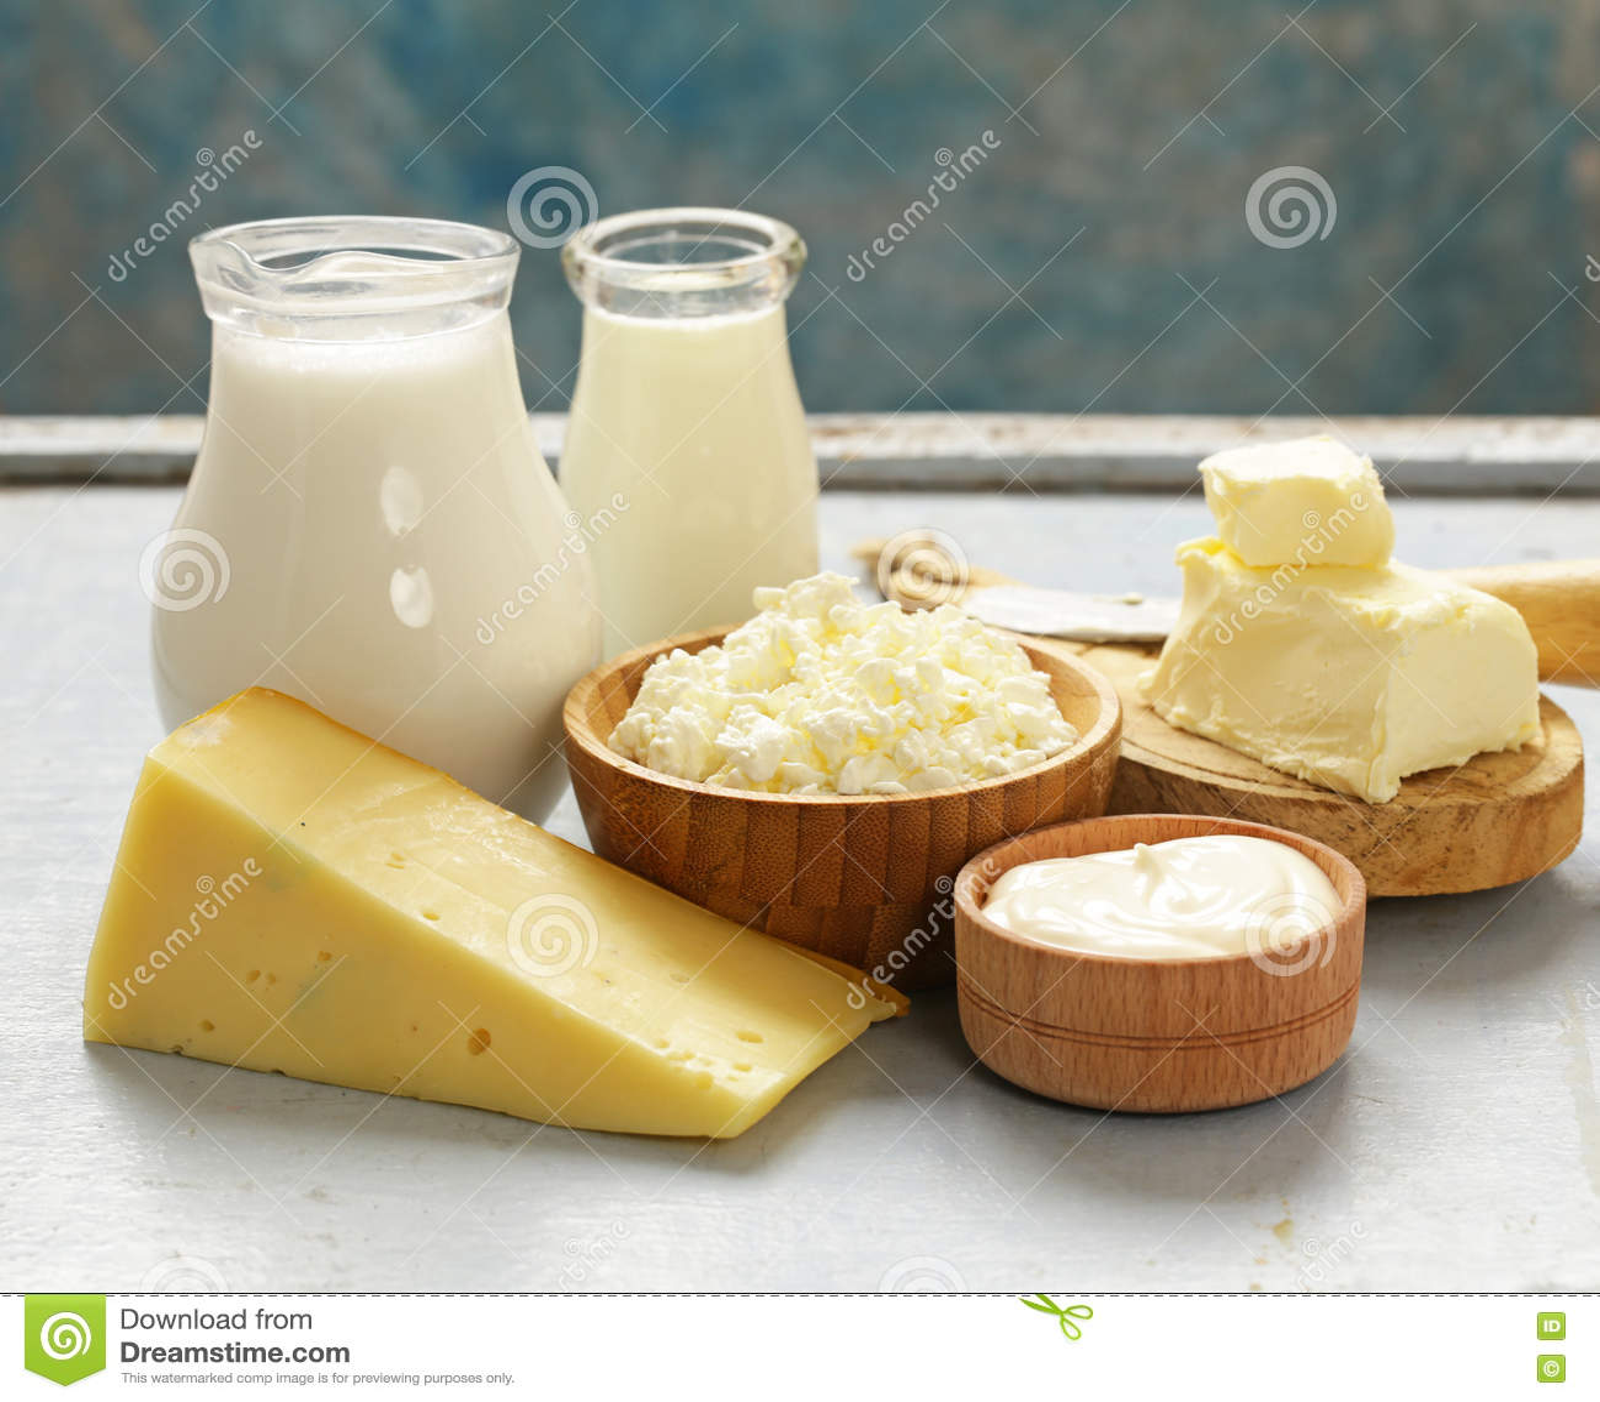 Assorted dairy products milk, yogurt, cottage cheese, sour cream